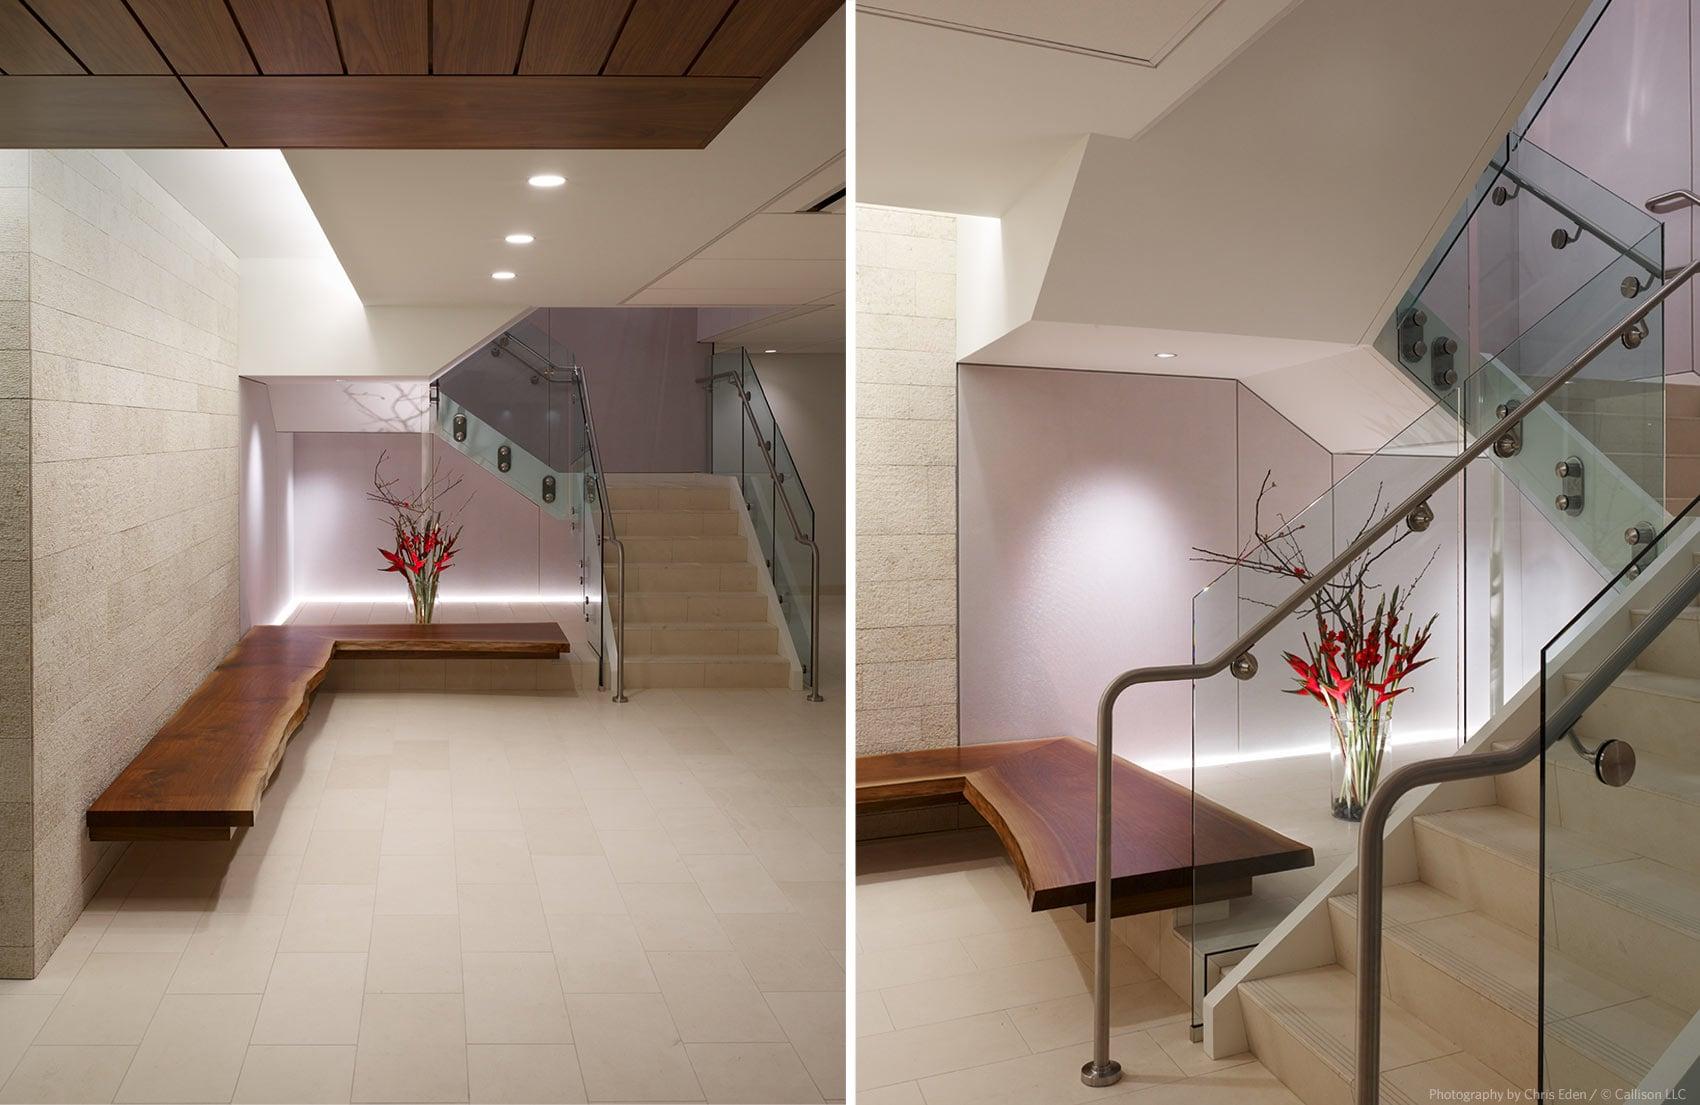 Carlsmith Ball Law Offices - Interior lobby